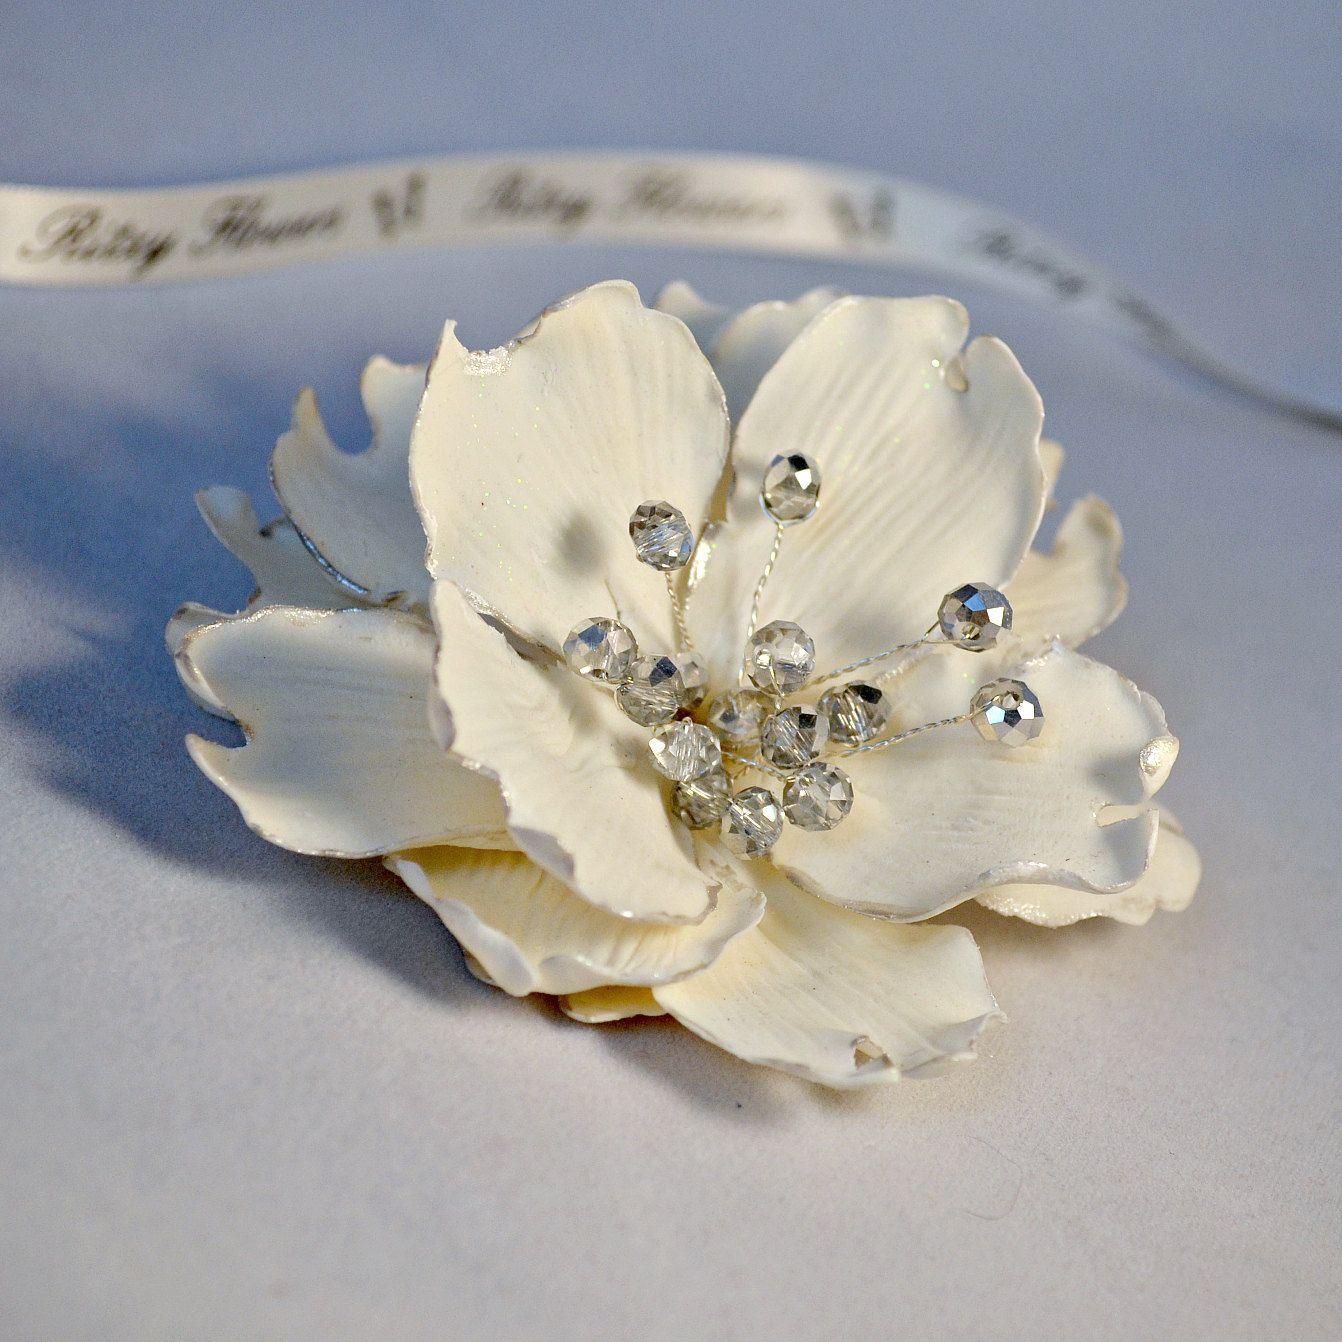 Trendy bridal headpiece - Wedding Hair Flower Bridal Headpiece Ceramic Peony Clip With Silver Crystals Classy Bride